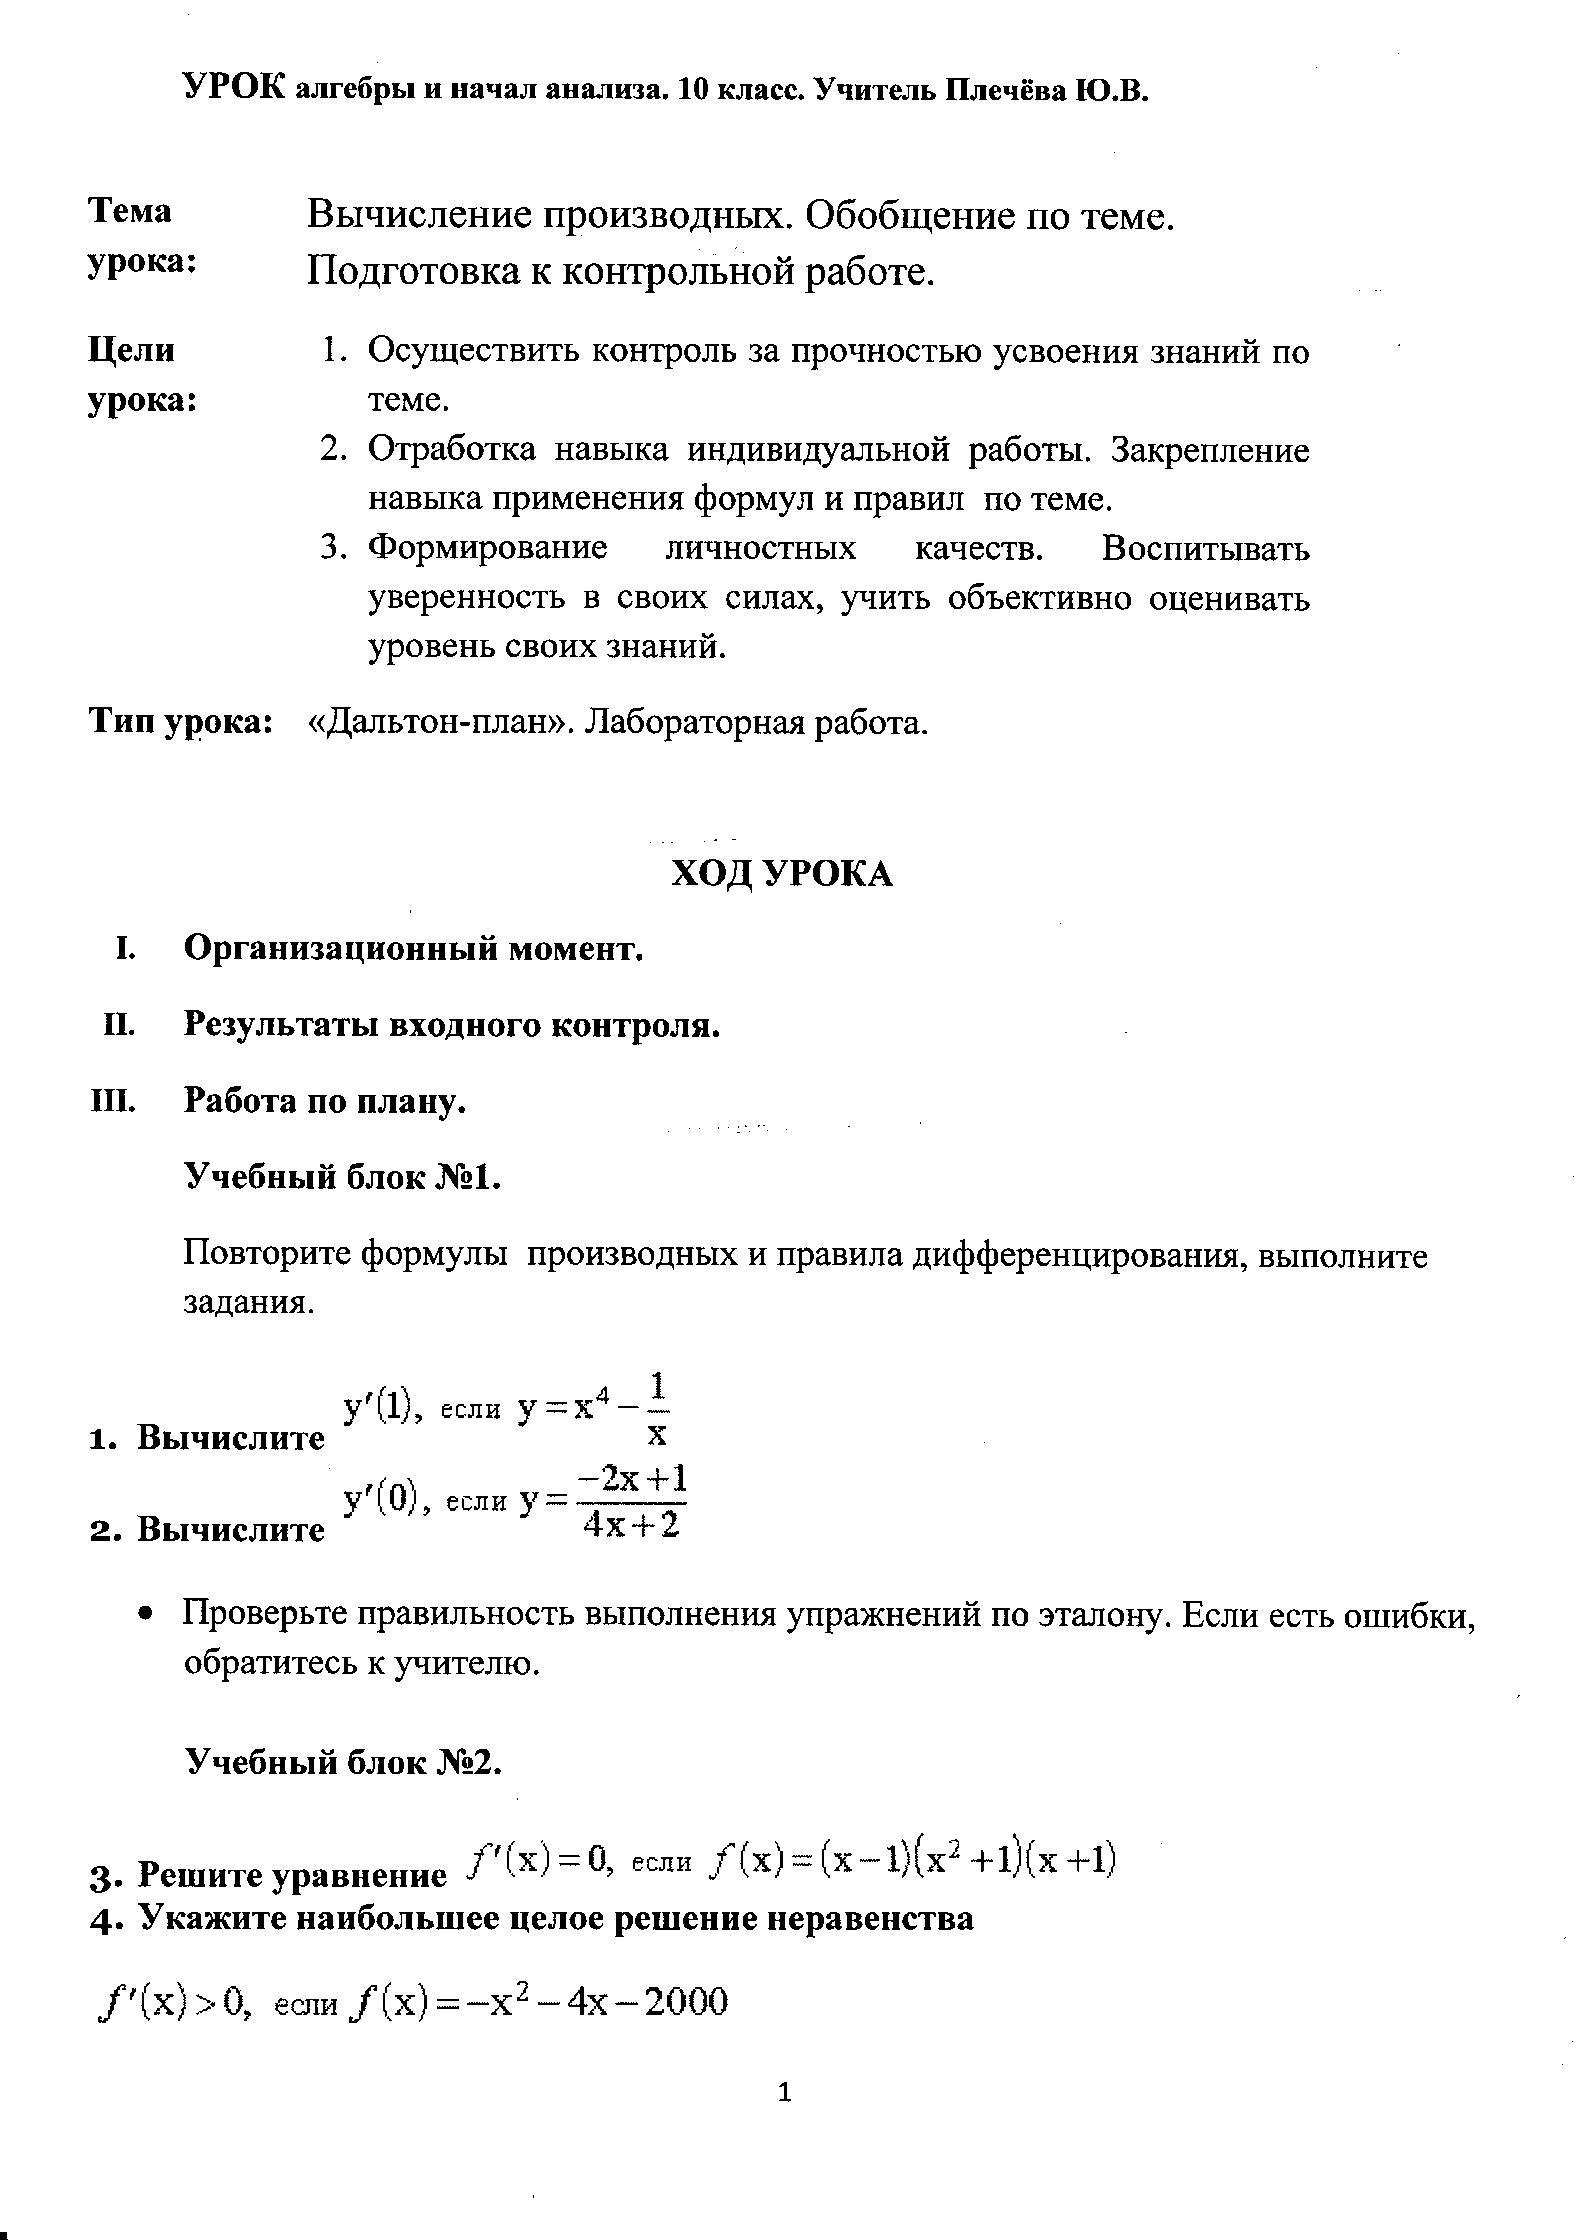 C:\Documents and Settings\Юлия\Мои документы\Мои рисунки\MP Navigator EX\2012_02_20\IMG_0001.tif